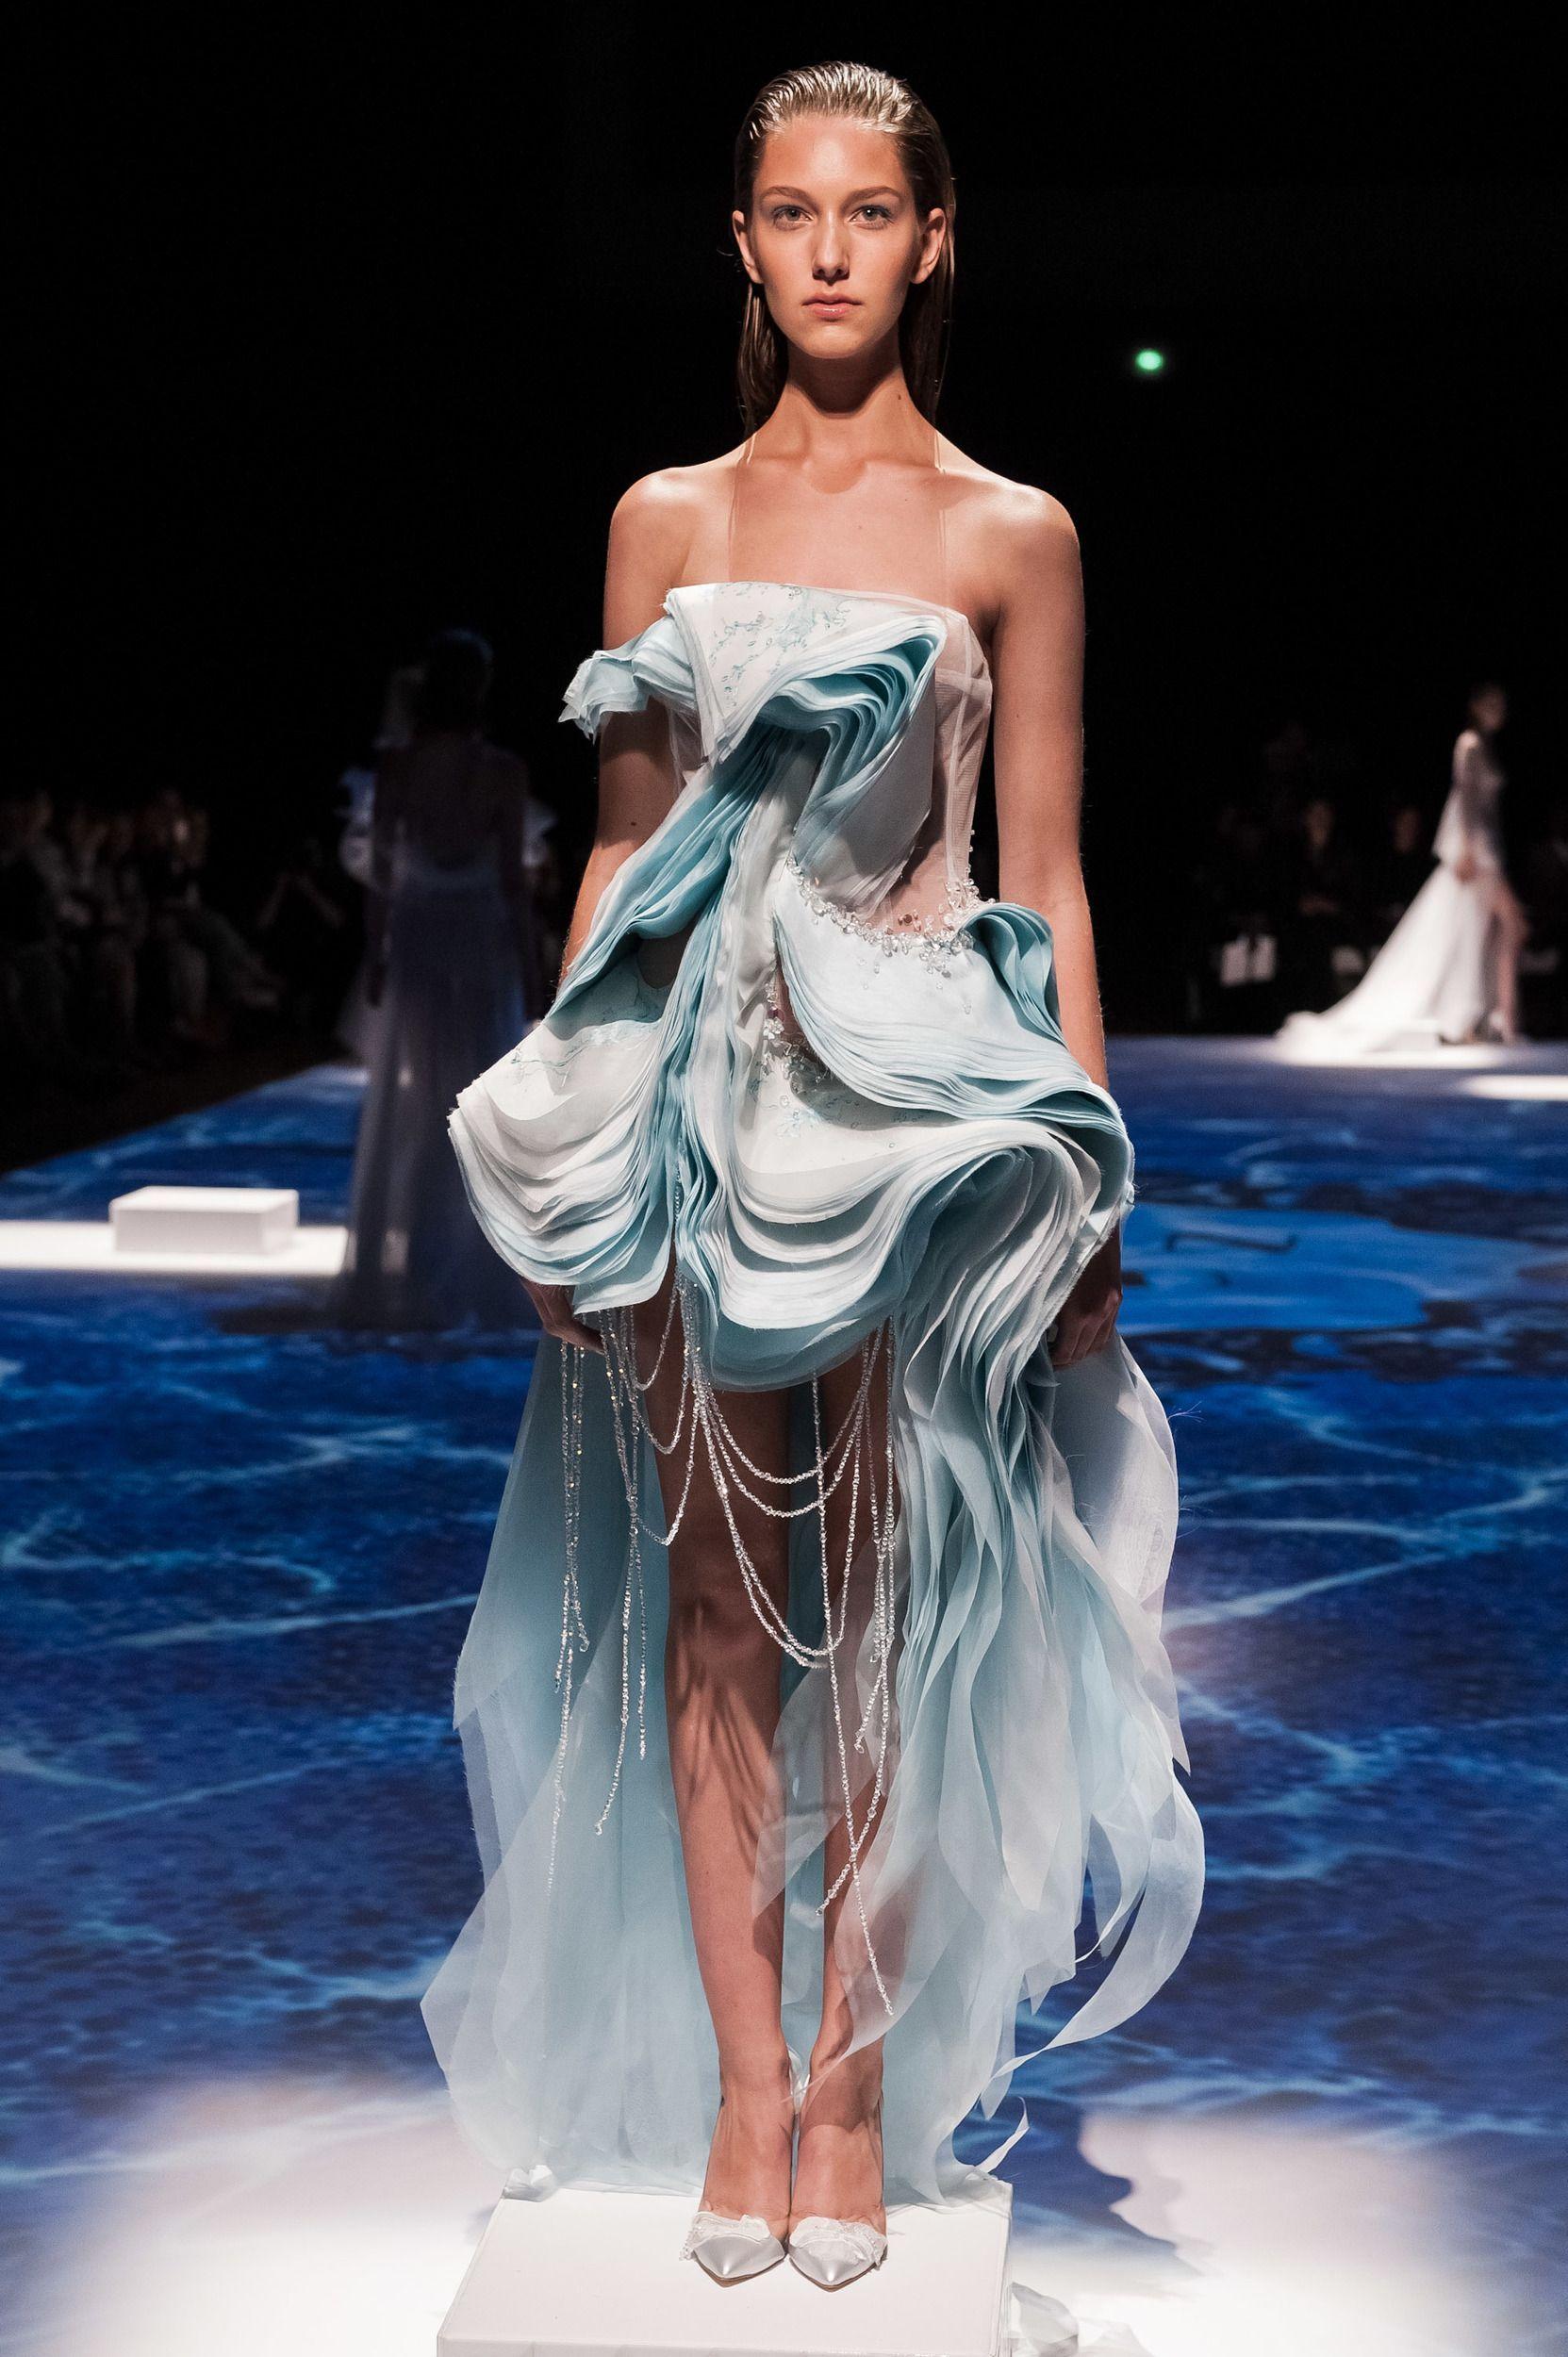 Couture #diy haute couture dress #Fallwinter #Haute #haute couture